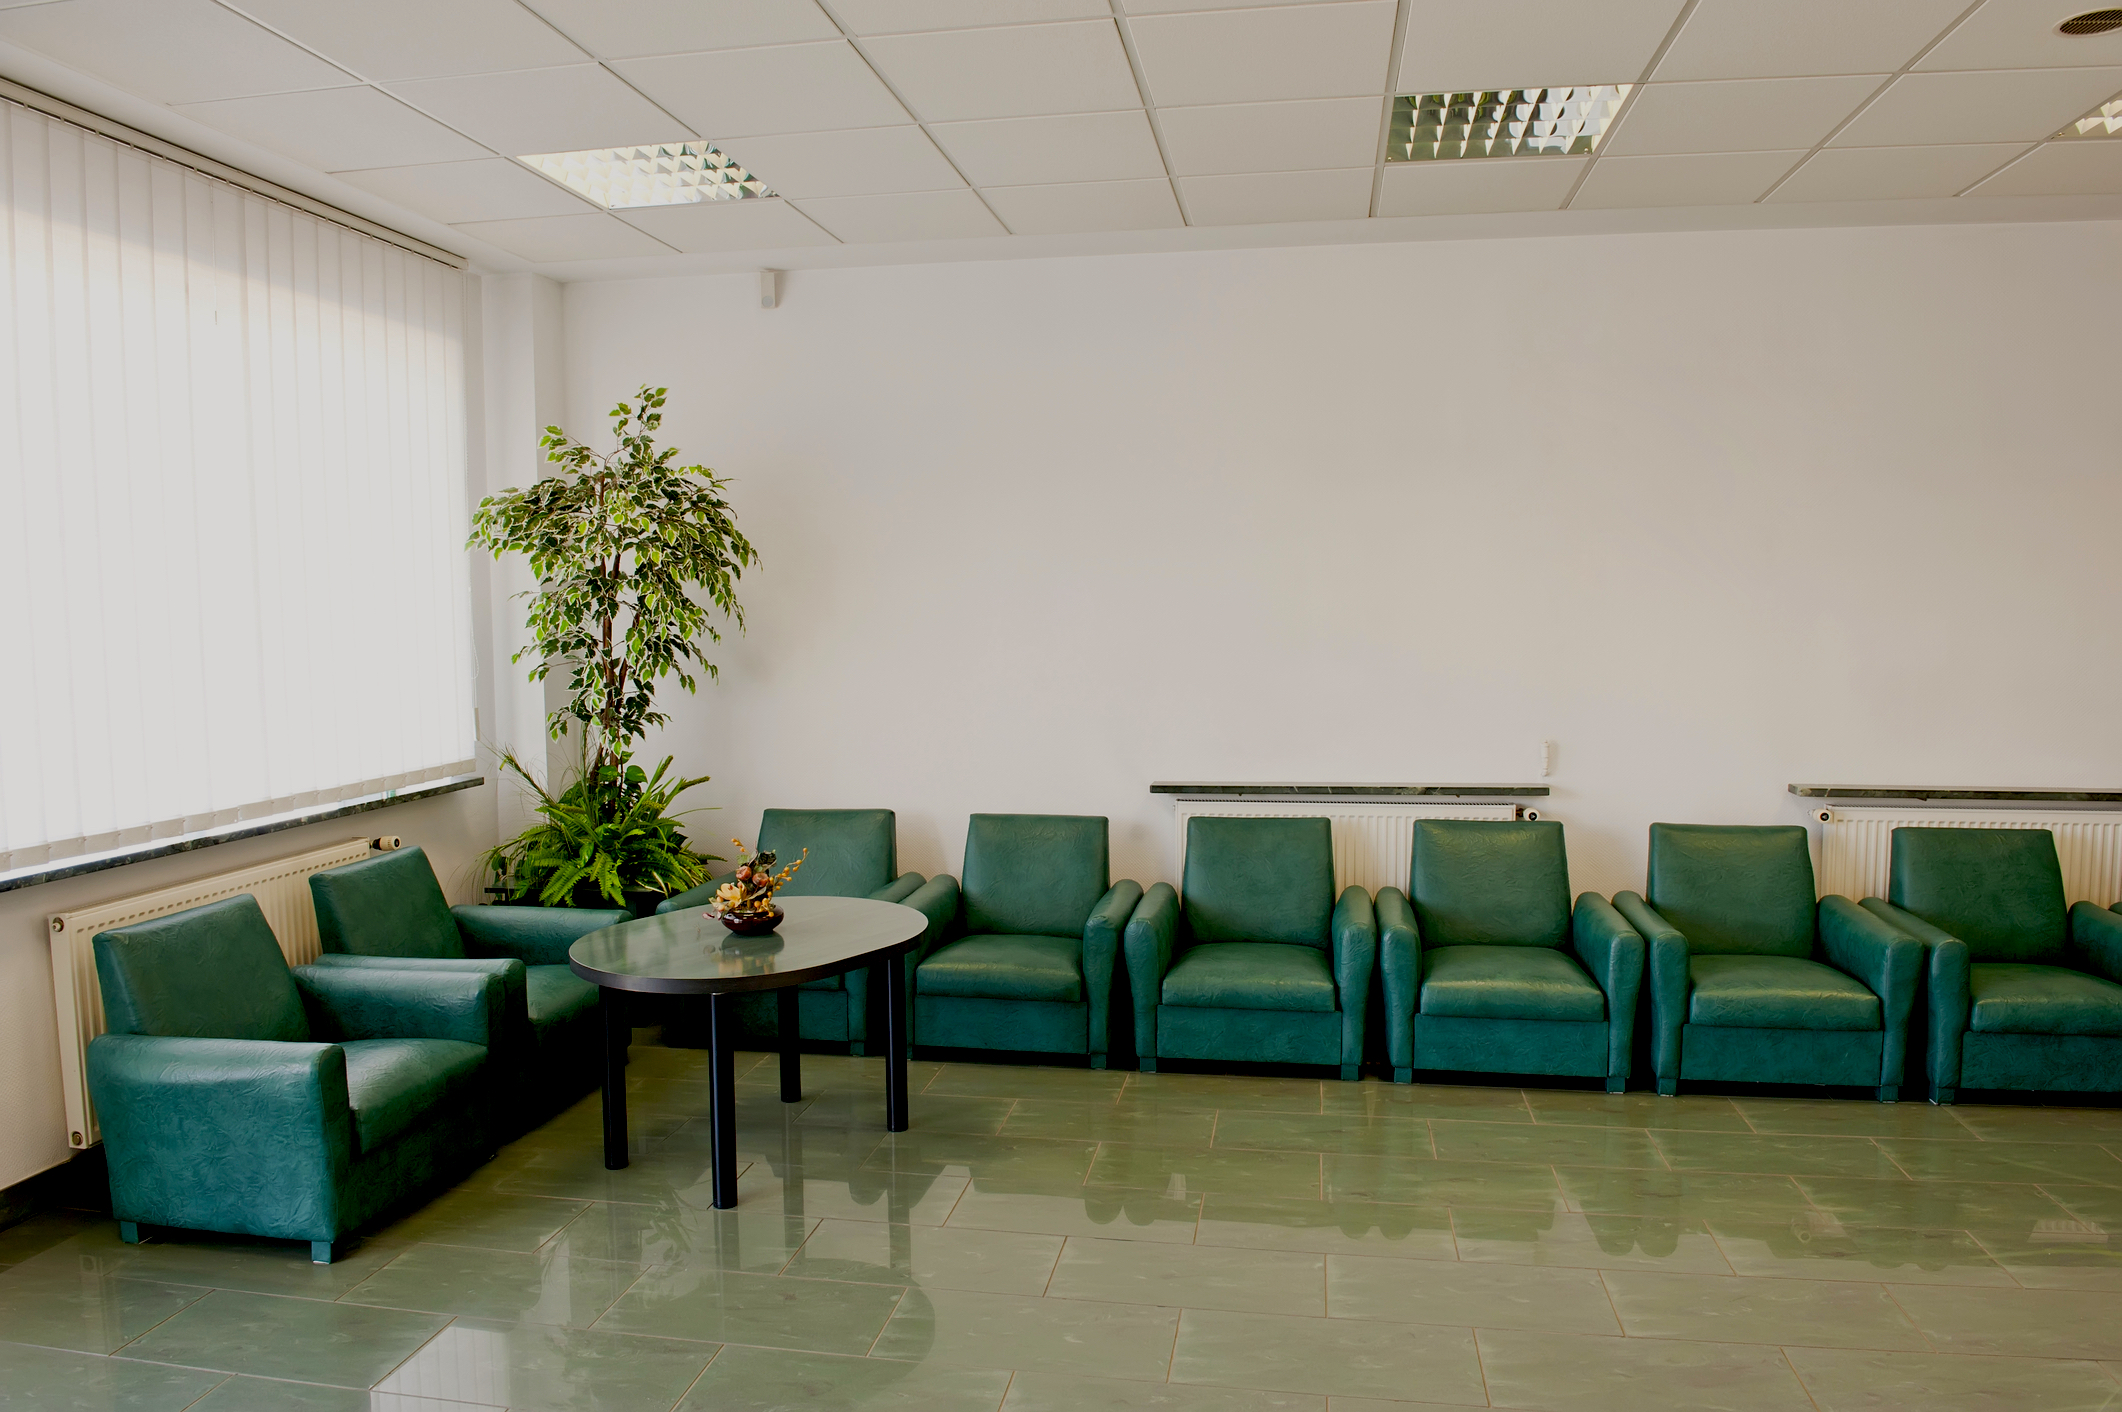 Modern hospital waiting room